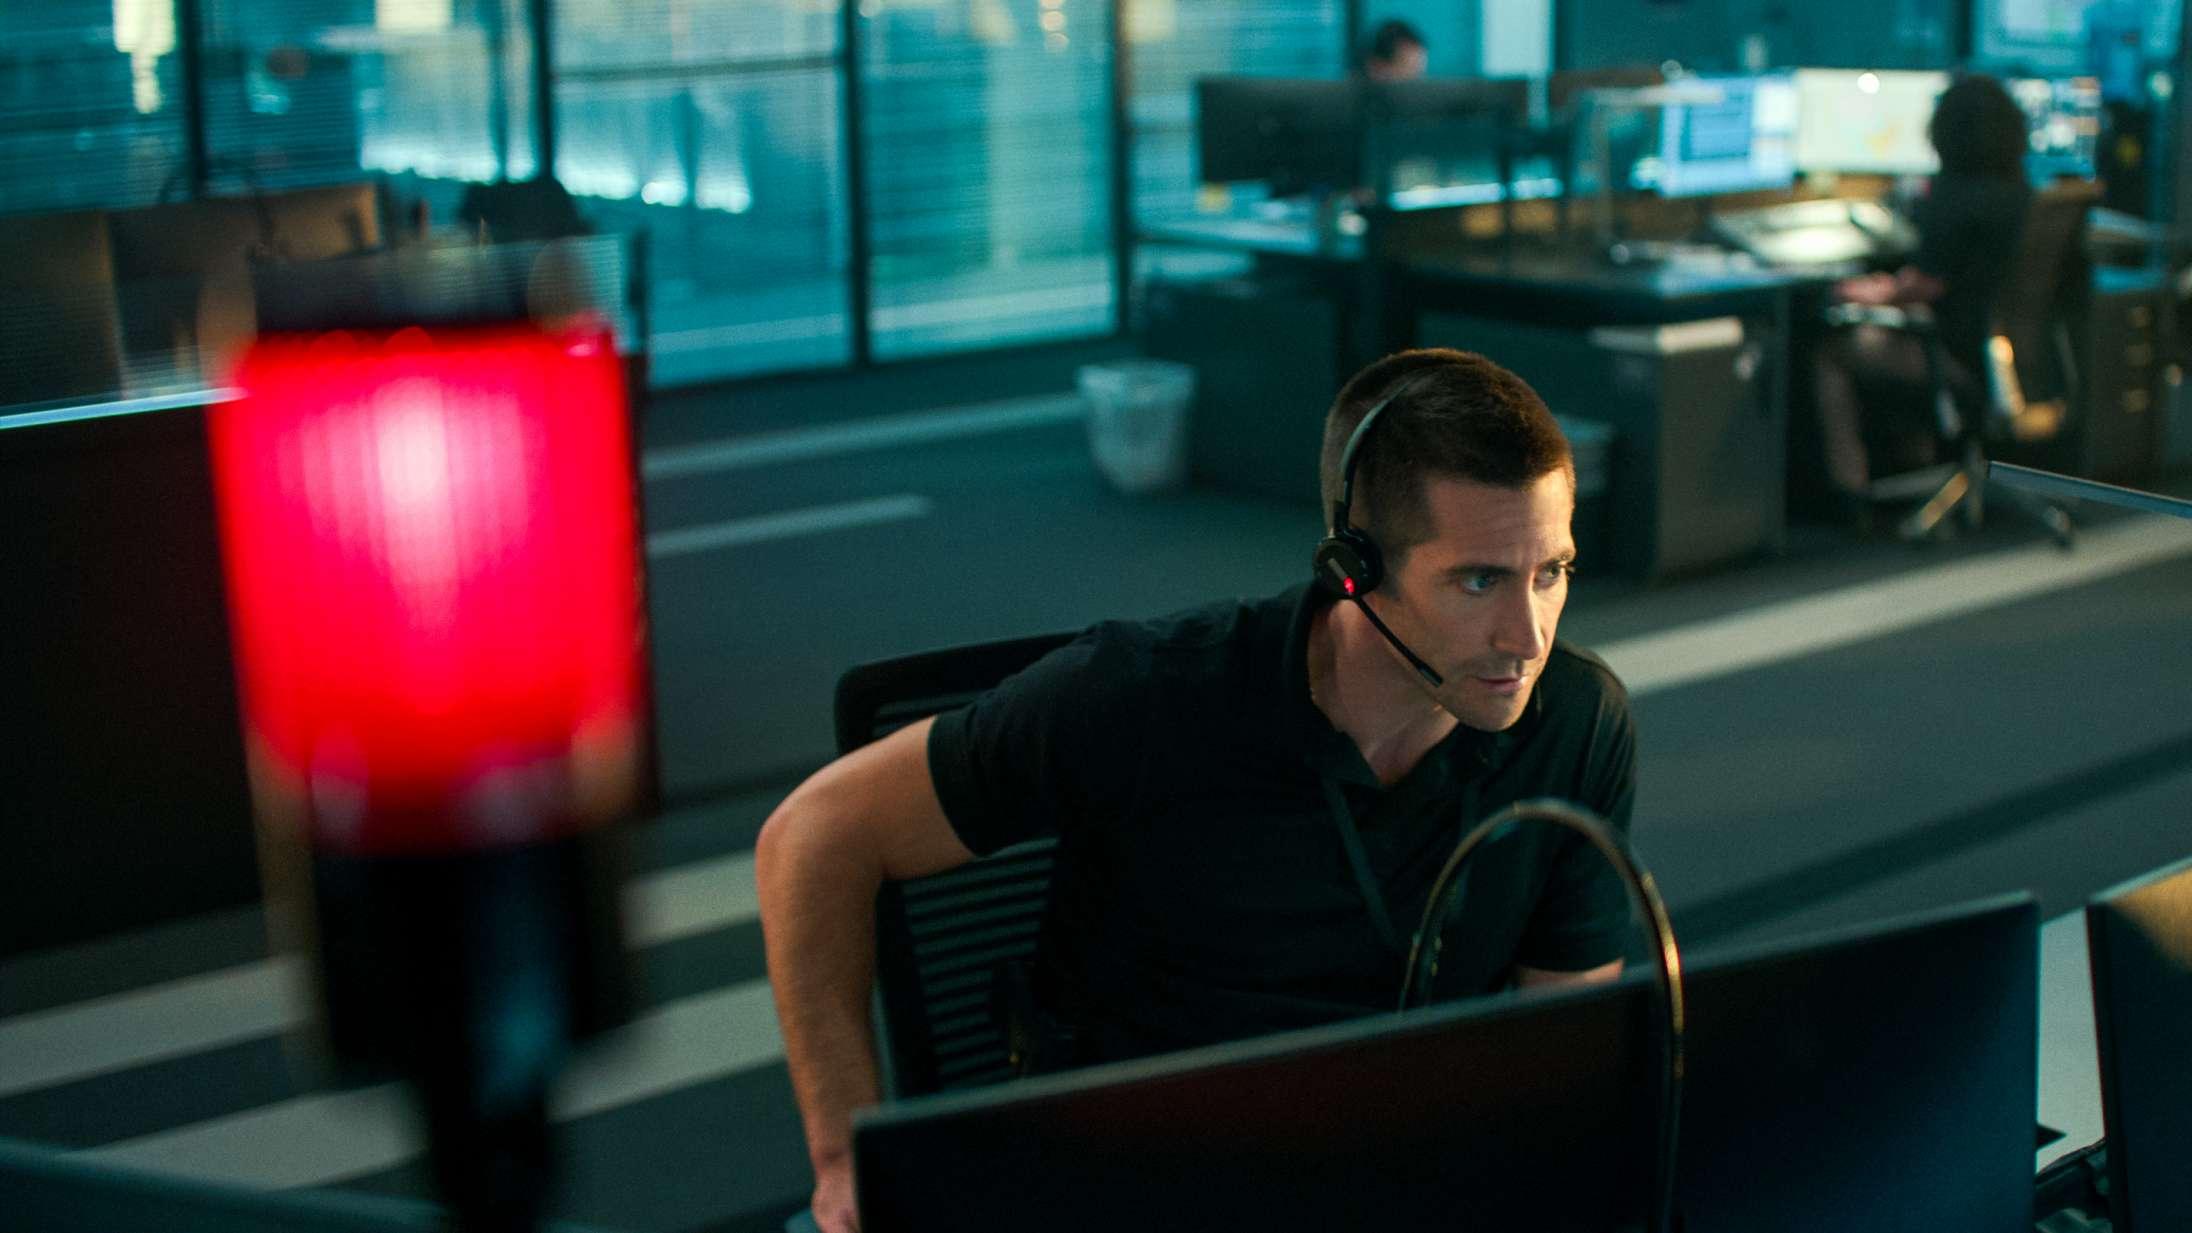 'The Guilty': Dansk thrillerhit er stadig et vovestykke i remake med Jake Gyllenhaal